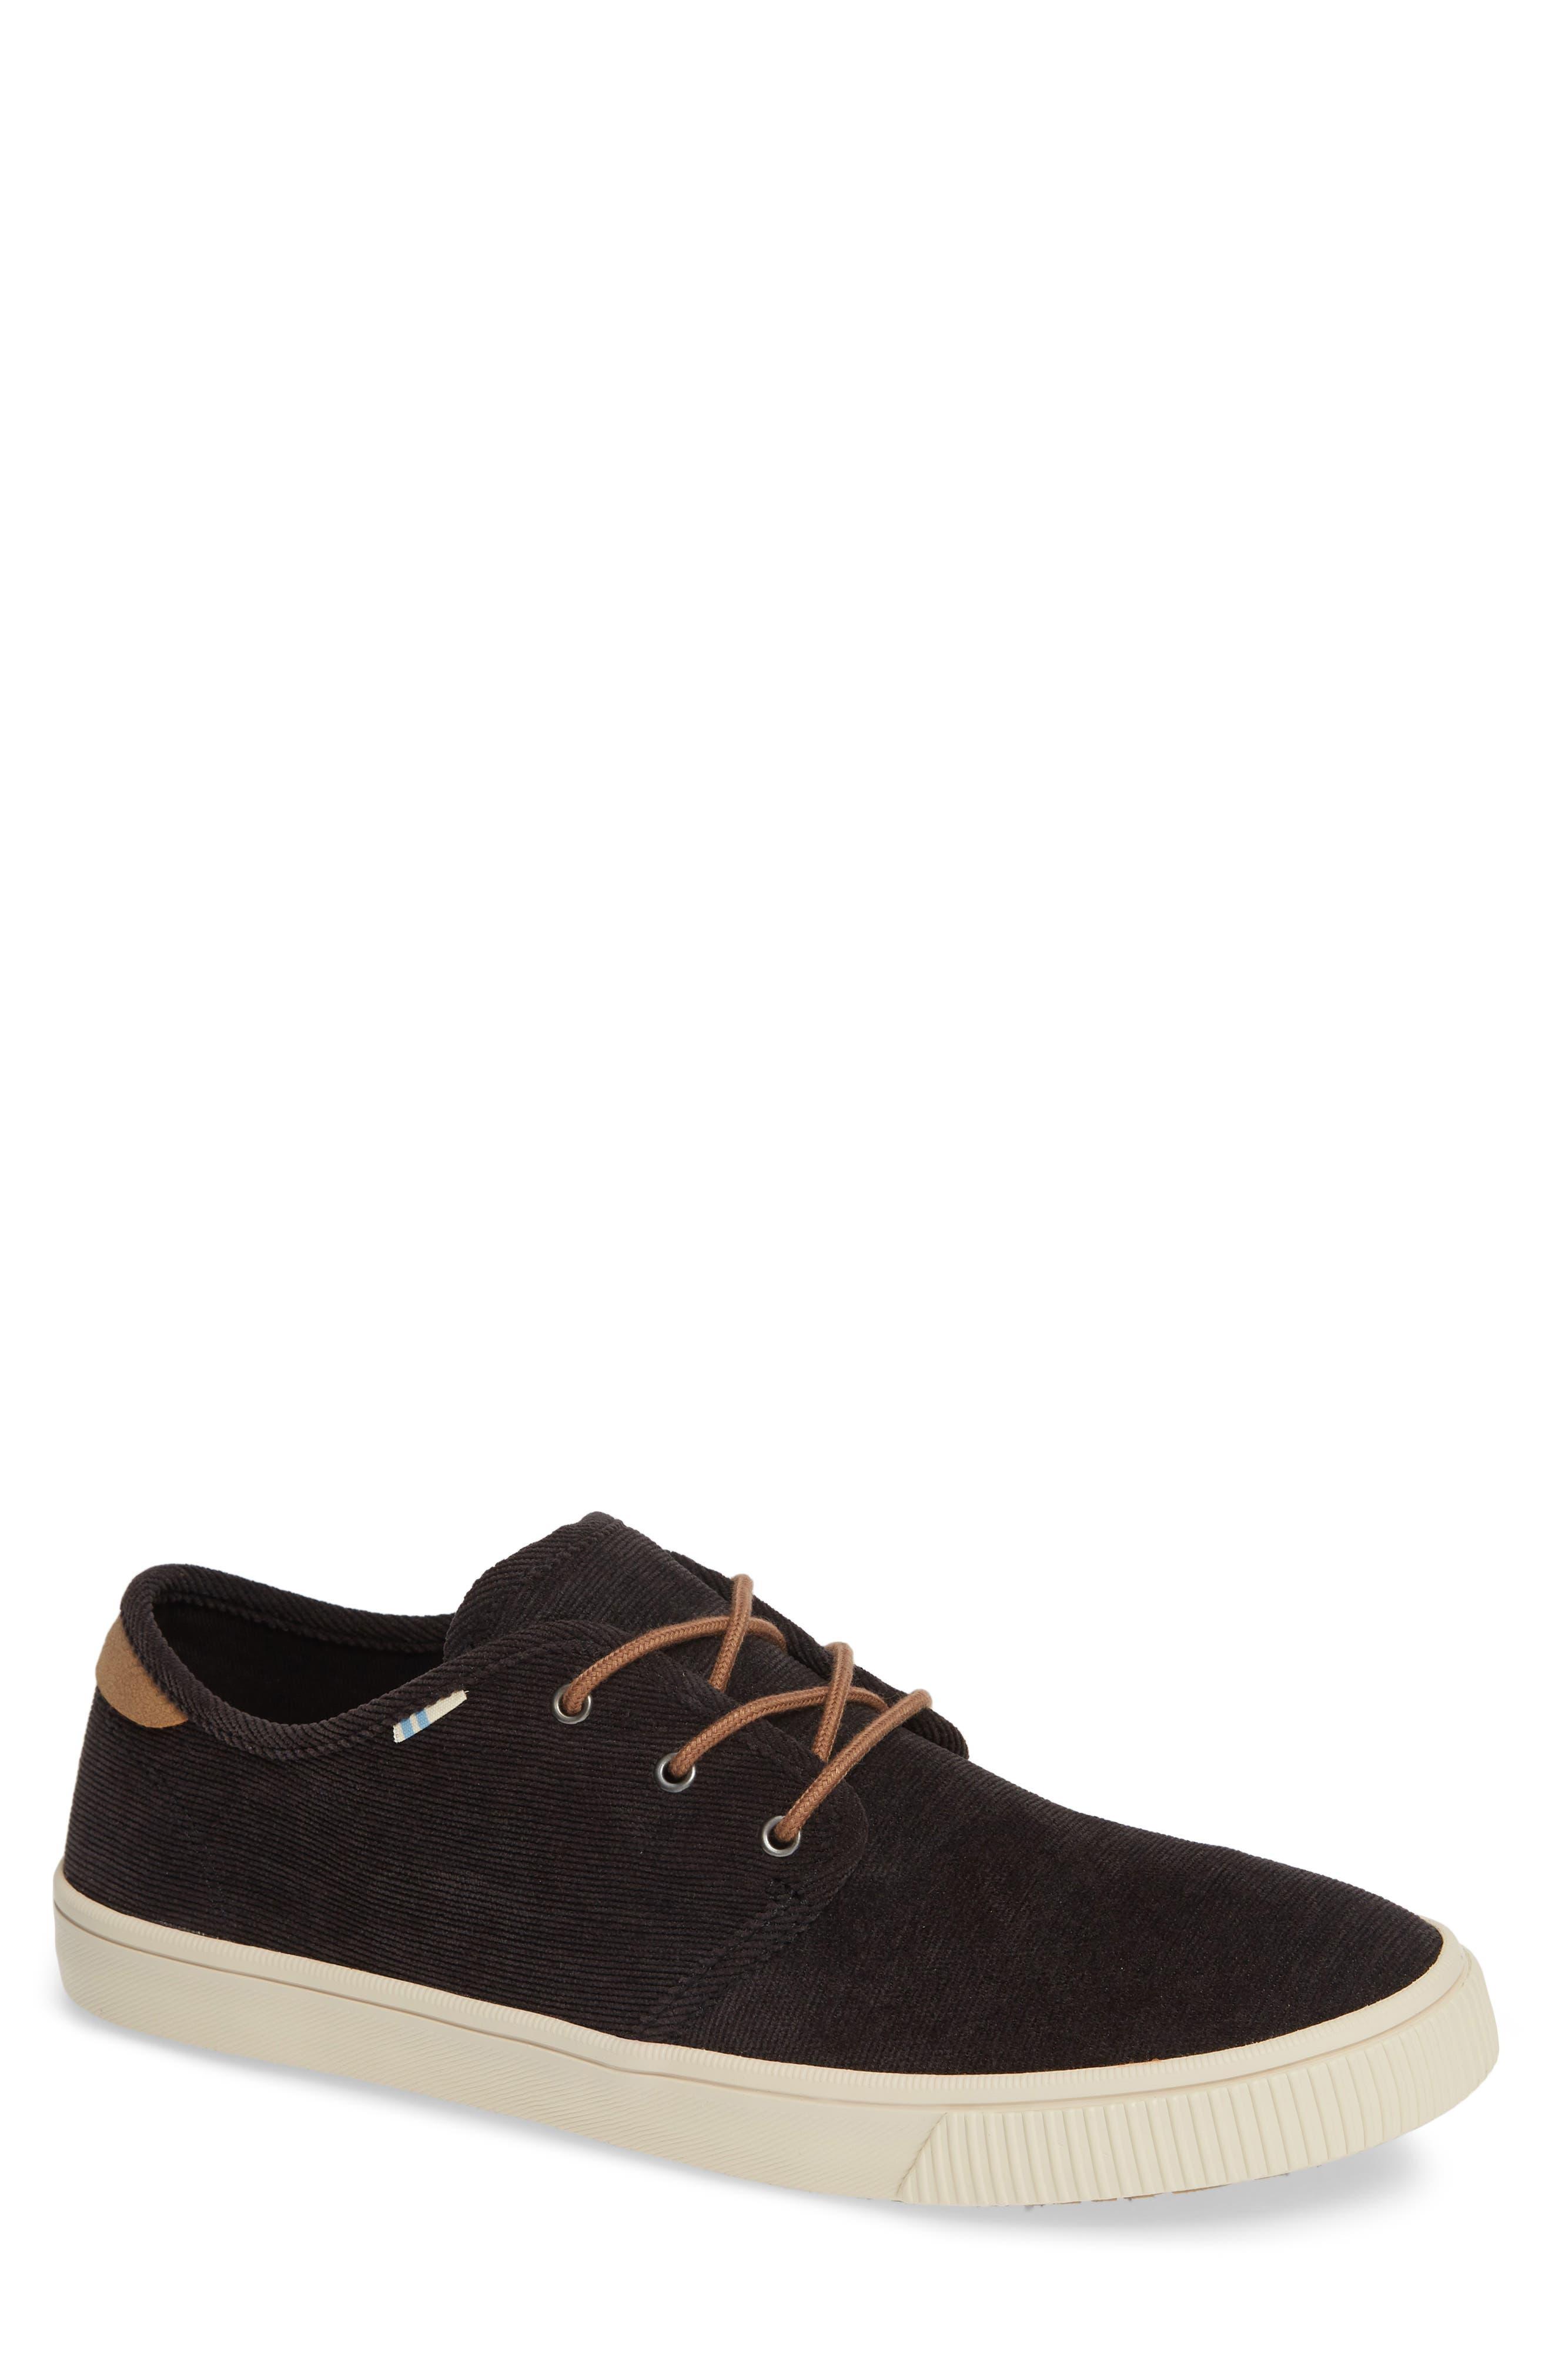 Carlo Sneaker,                         Main,                         color, BLACK